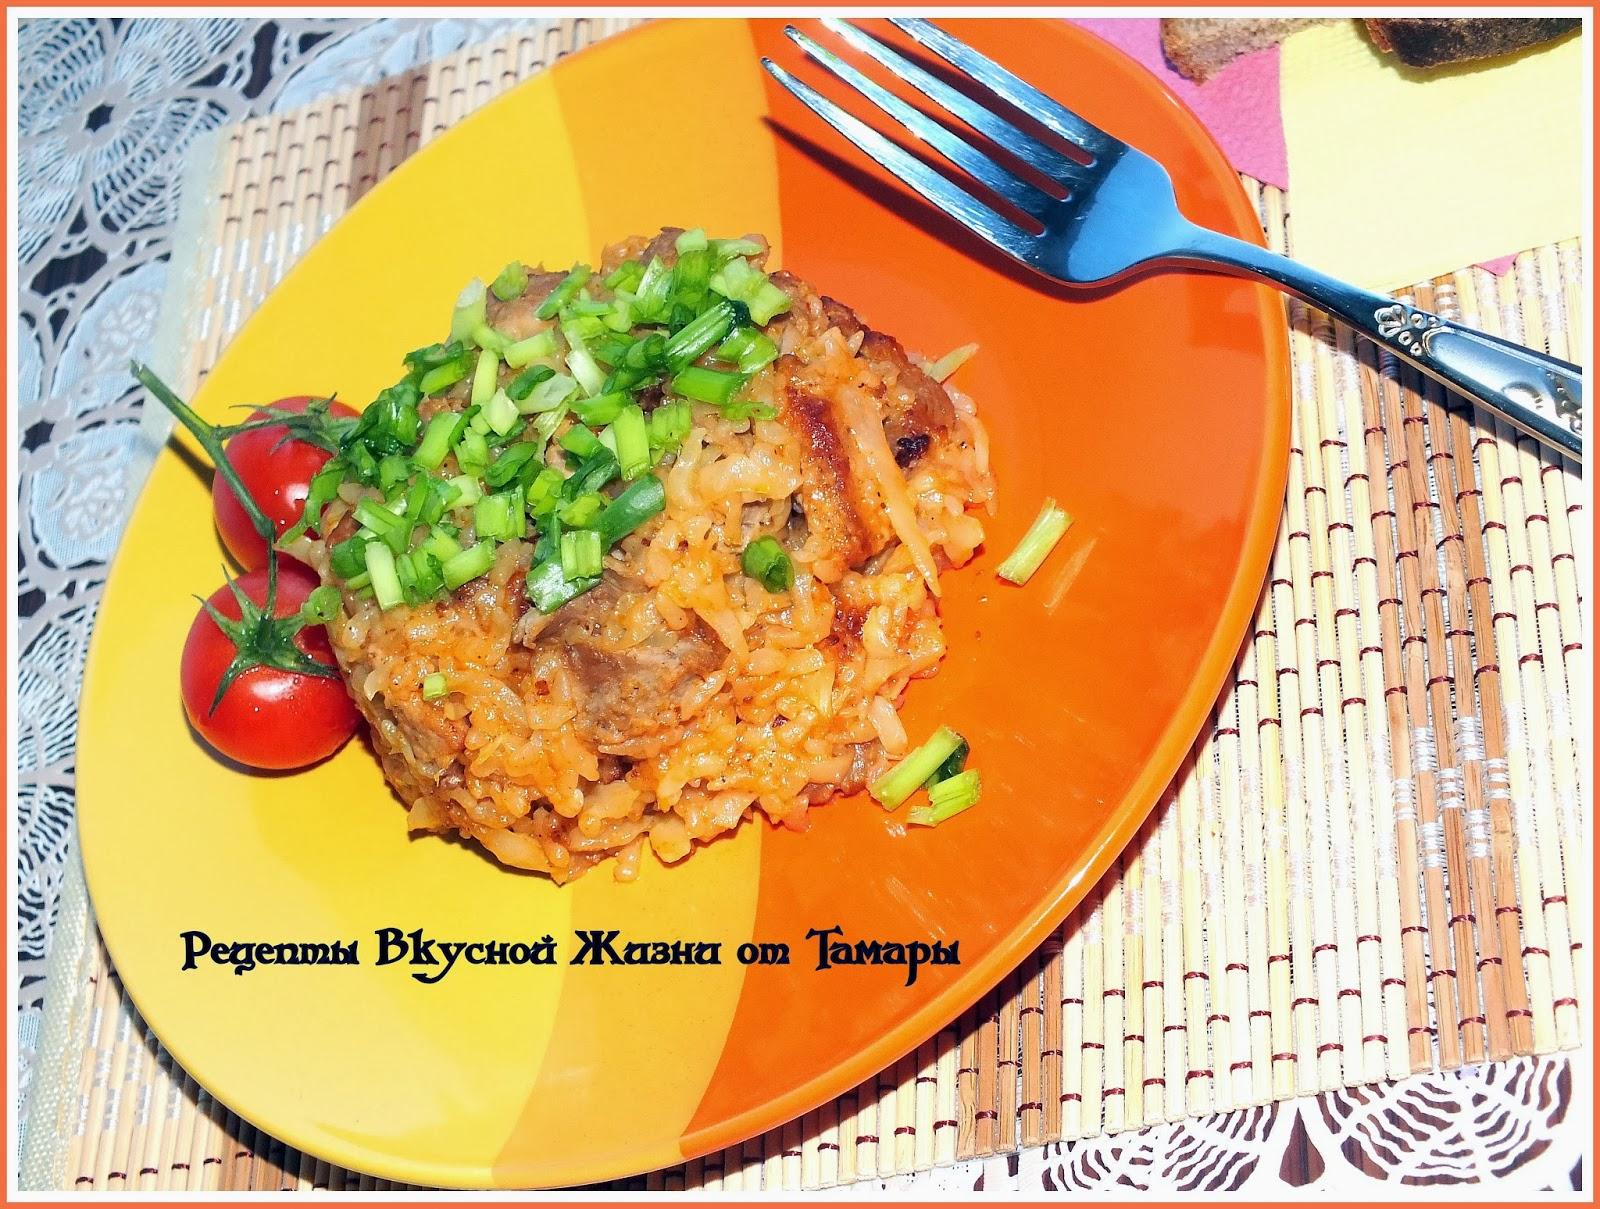 Еда солянка пошаговый рецепт